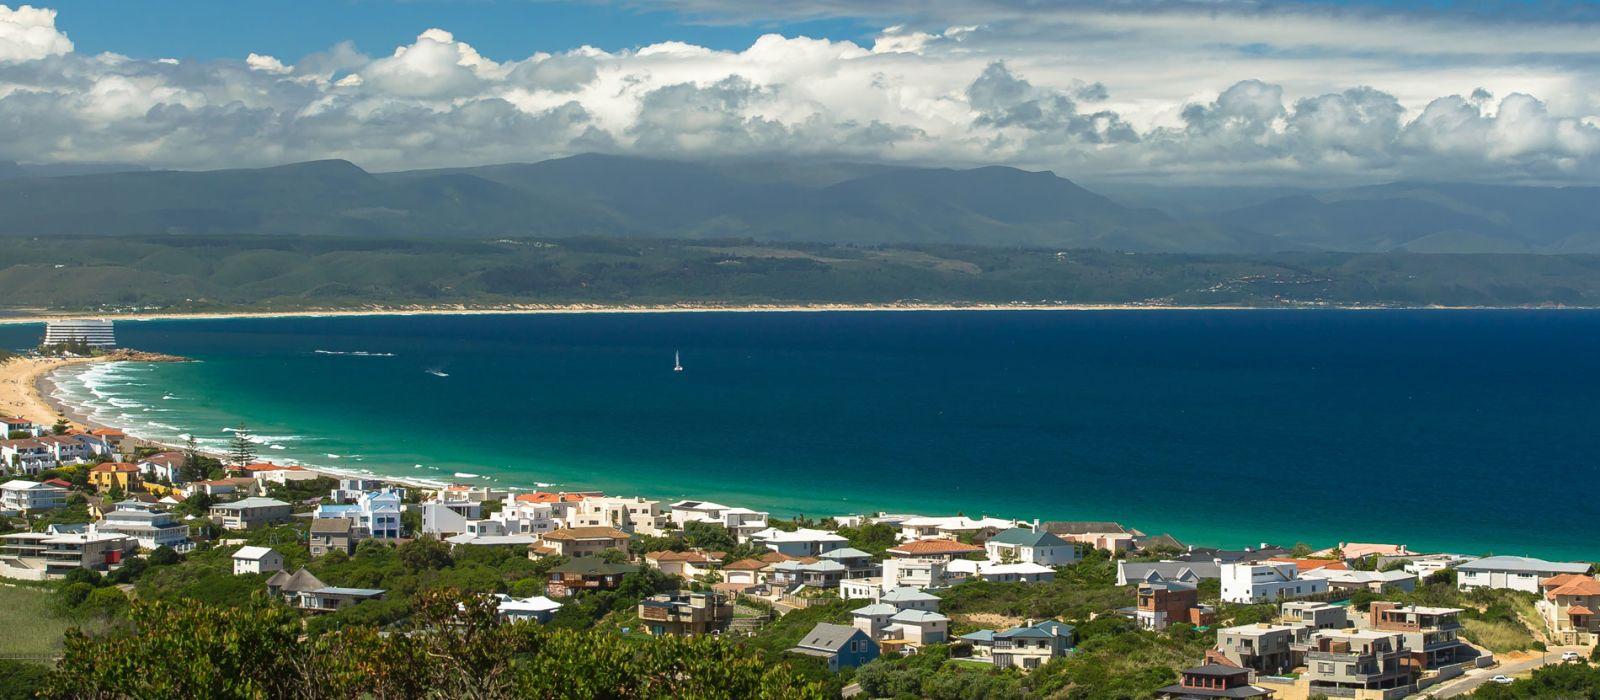 Reiseziel Plettenberg Bay Südafrika